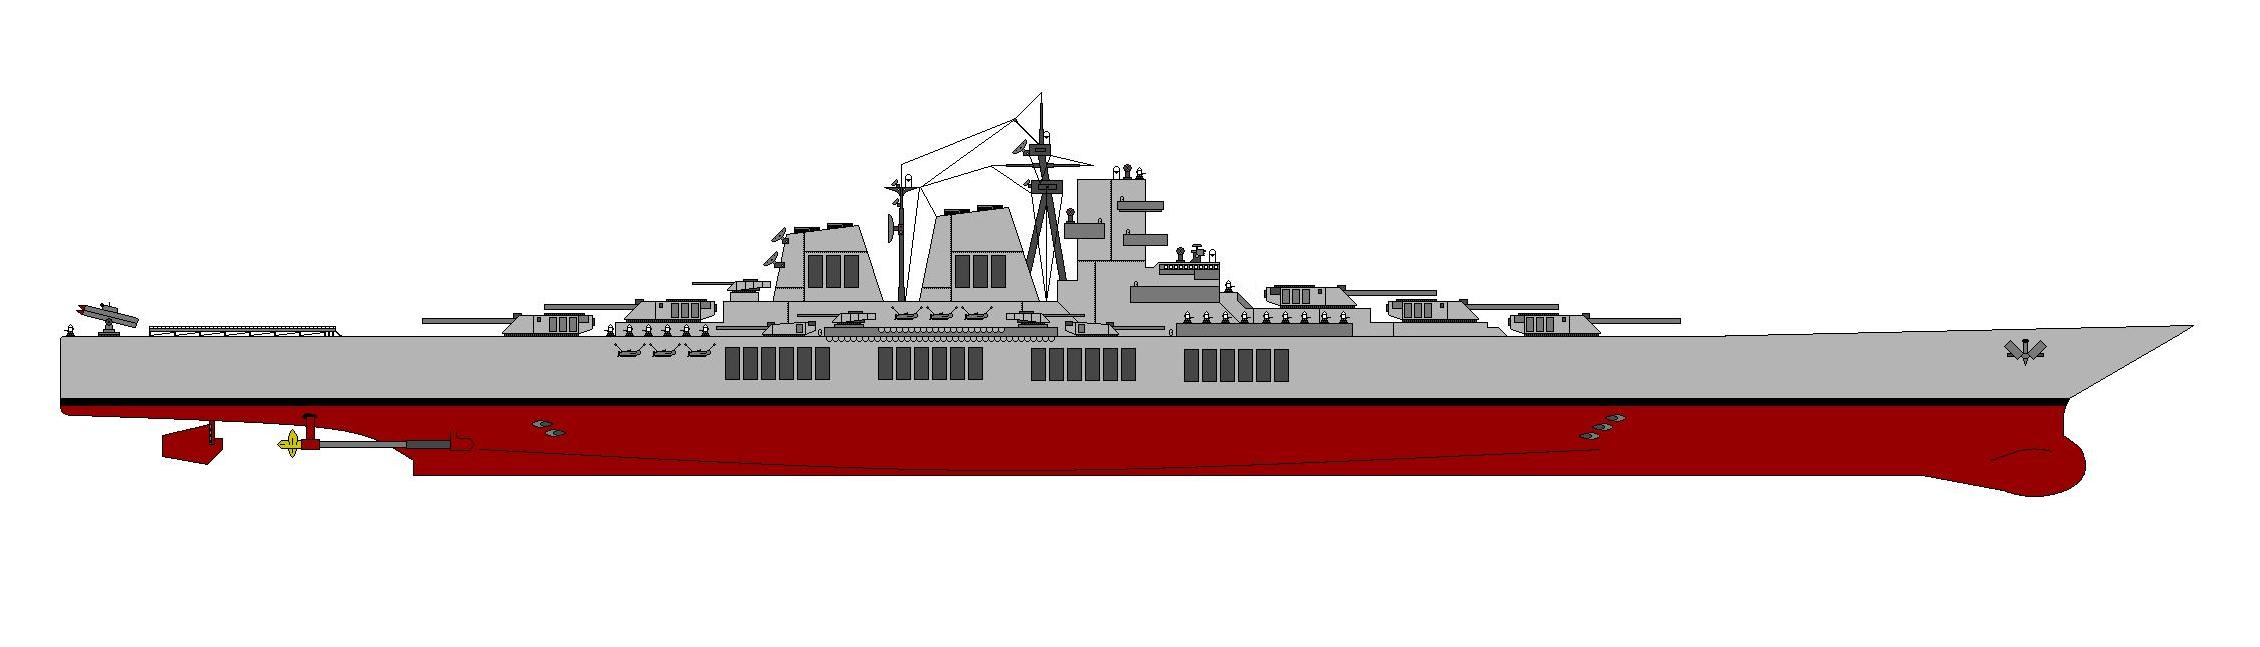 Battleship U.S.S. Mastershay by BeBop953 on DeviantArt Modern Us Battleship Design